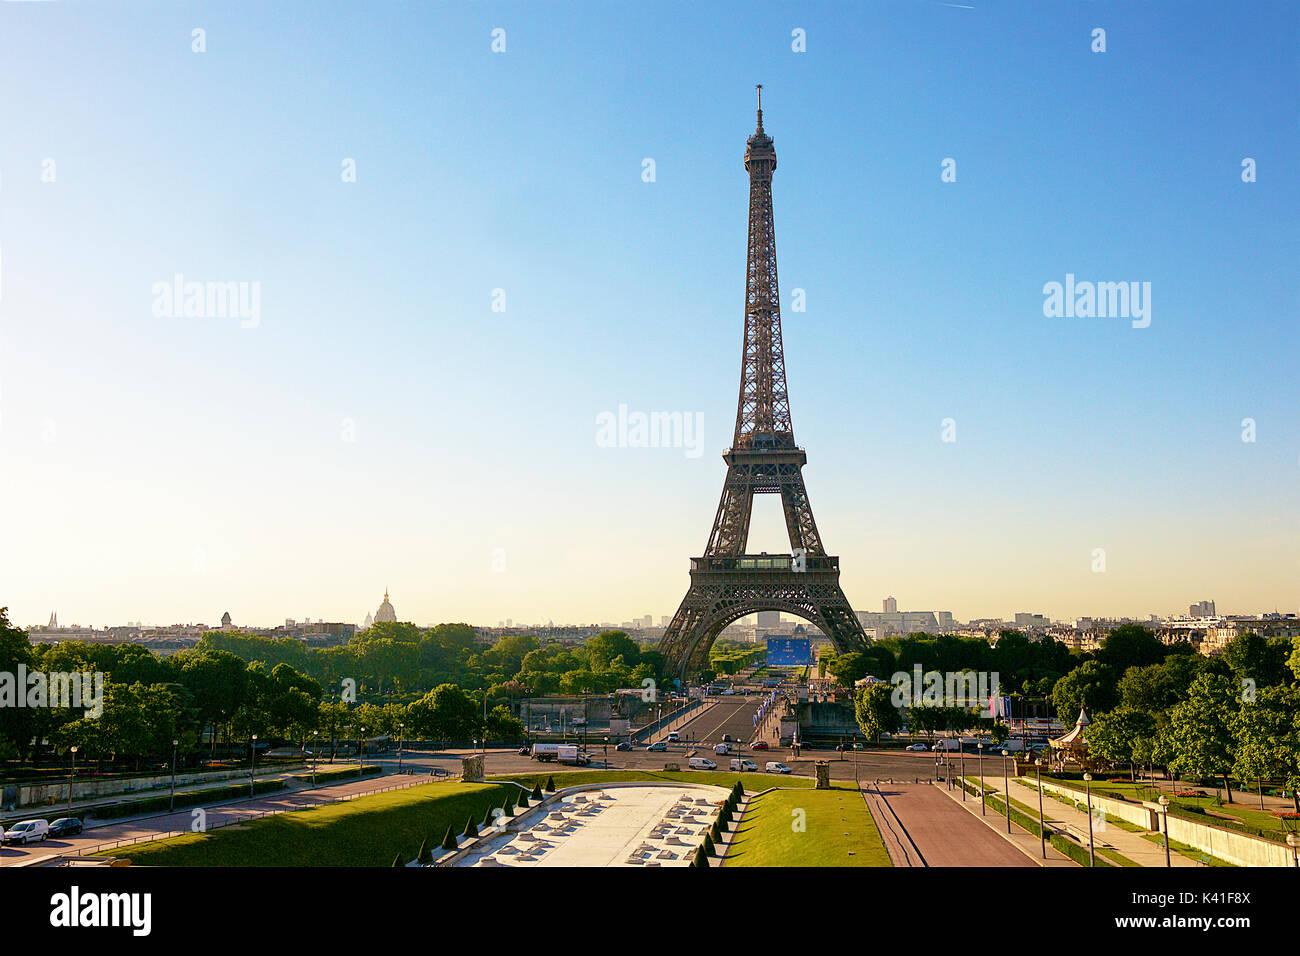 Eiffel Tower seen from Trocadero - Stock Image